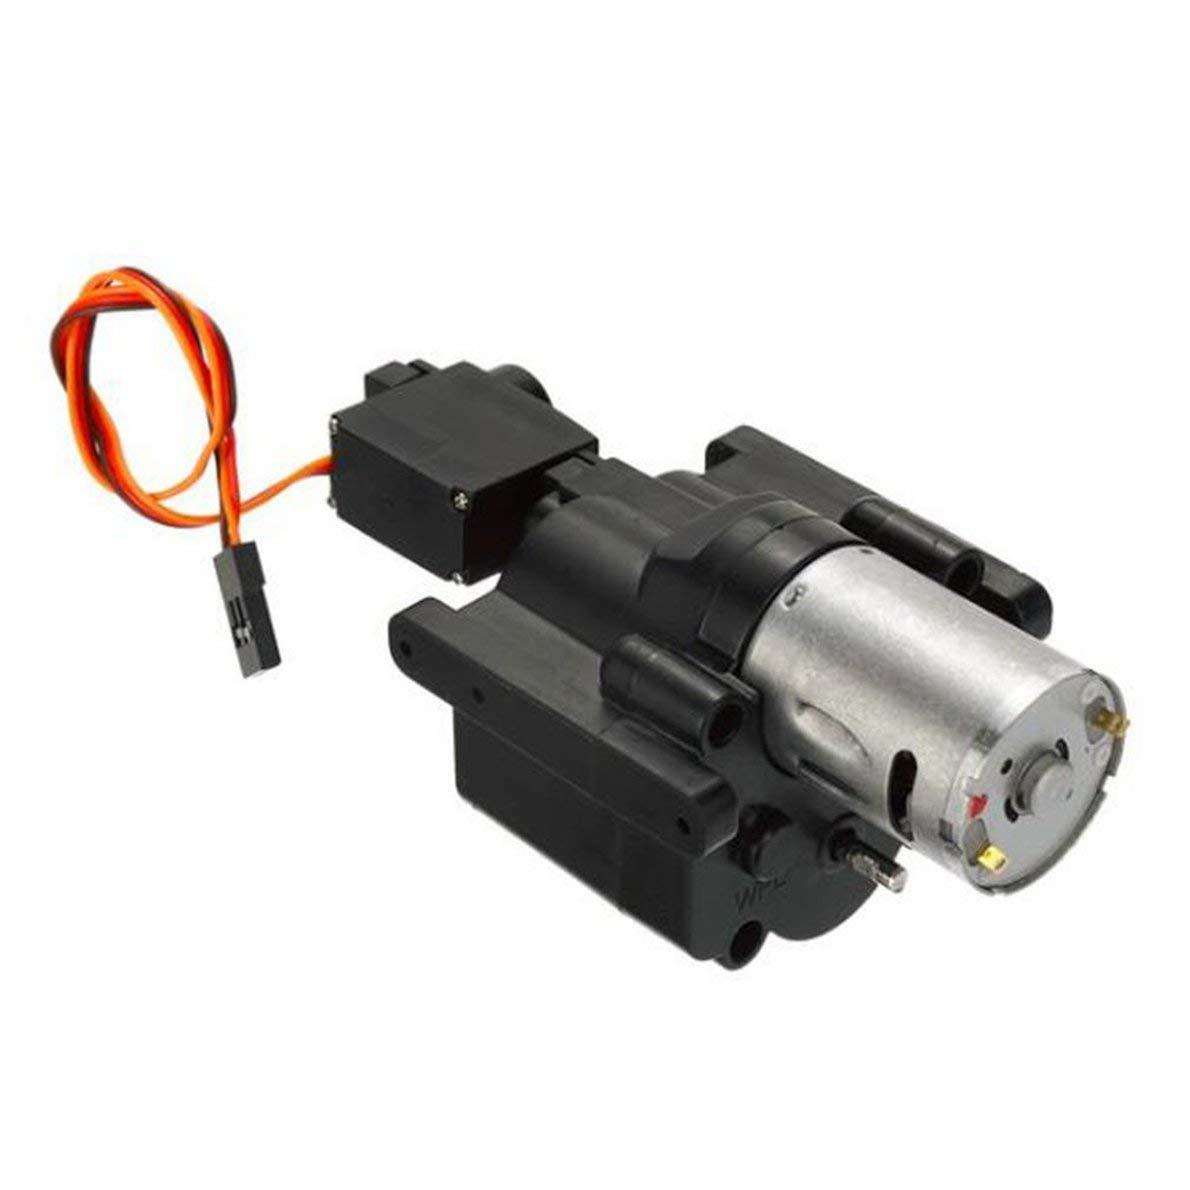 Speed Change Gear Box for WPL B-1 B-24 B-16 C-24 1/16 4WD 6WD RC Car Crawler 10km/h-30km/h Remote Control Parts & Accessory Crispsounds